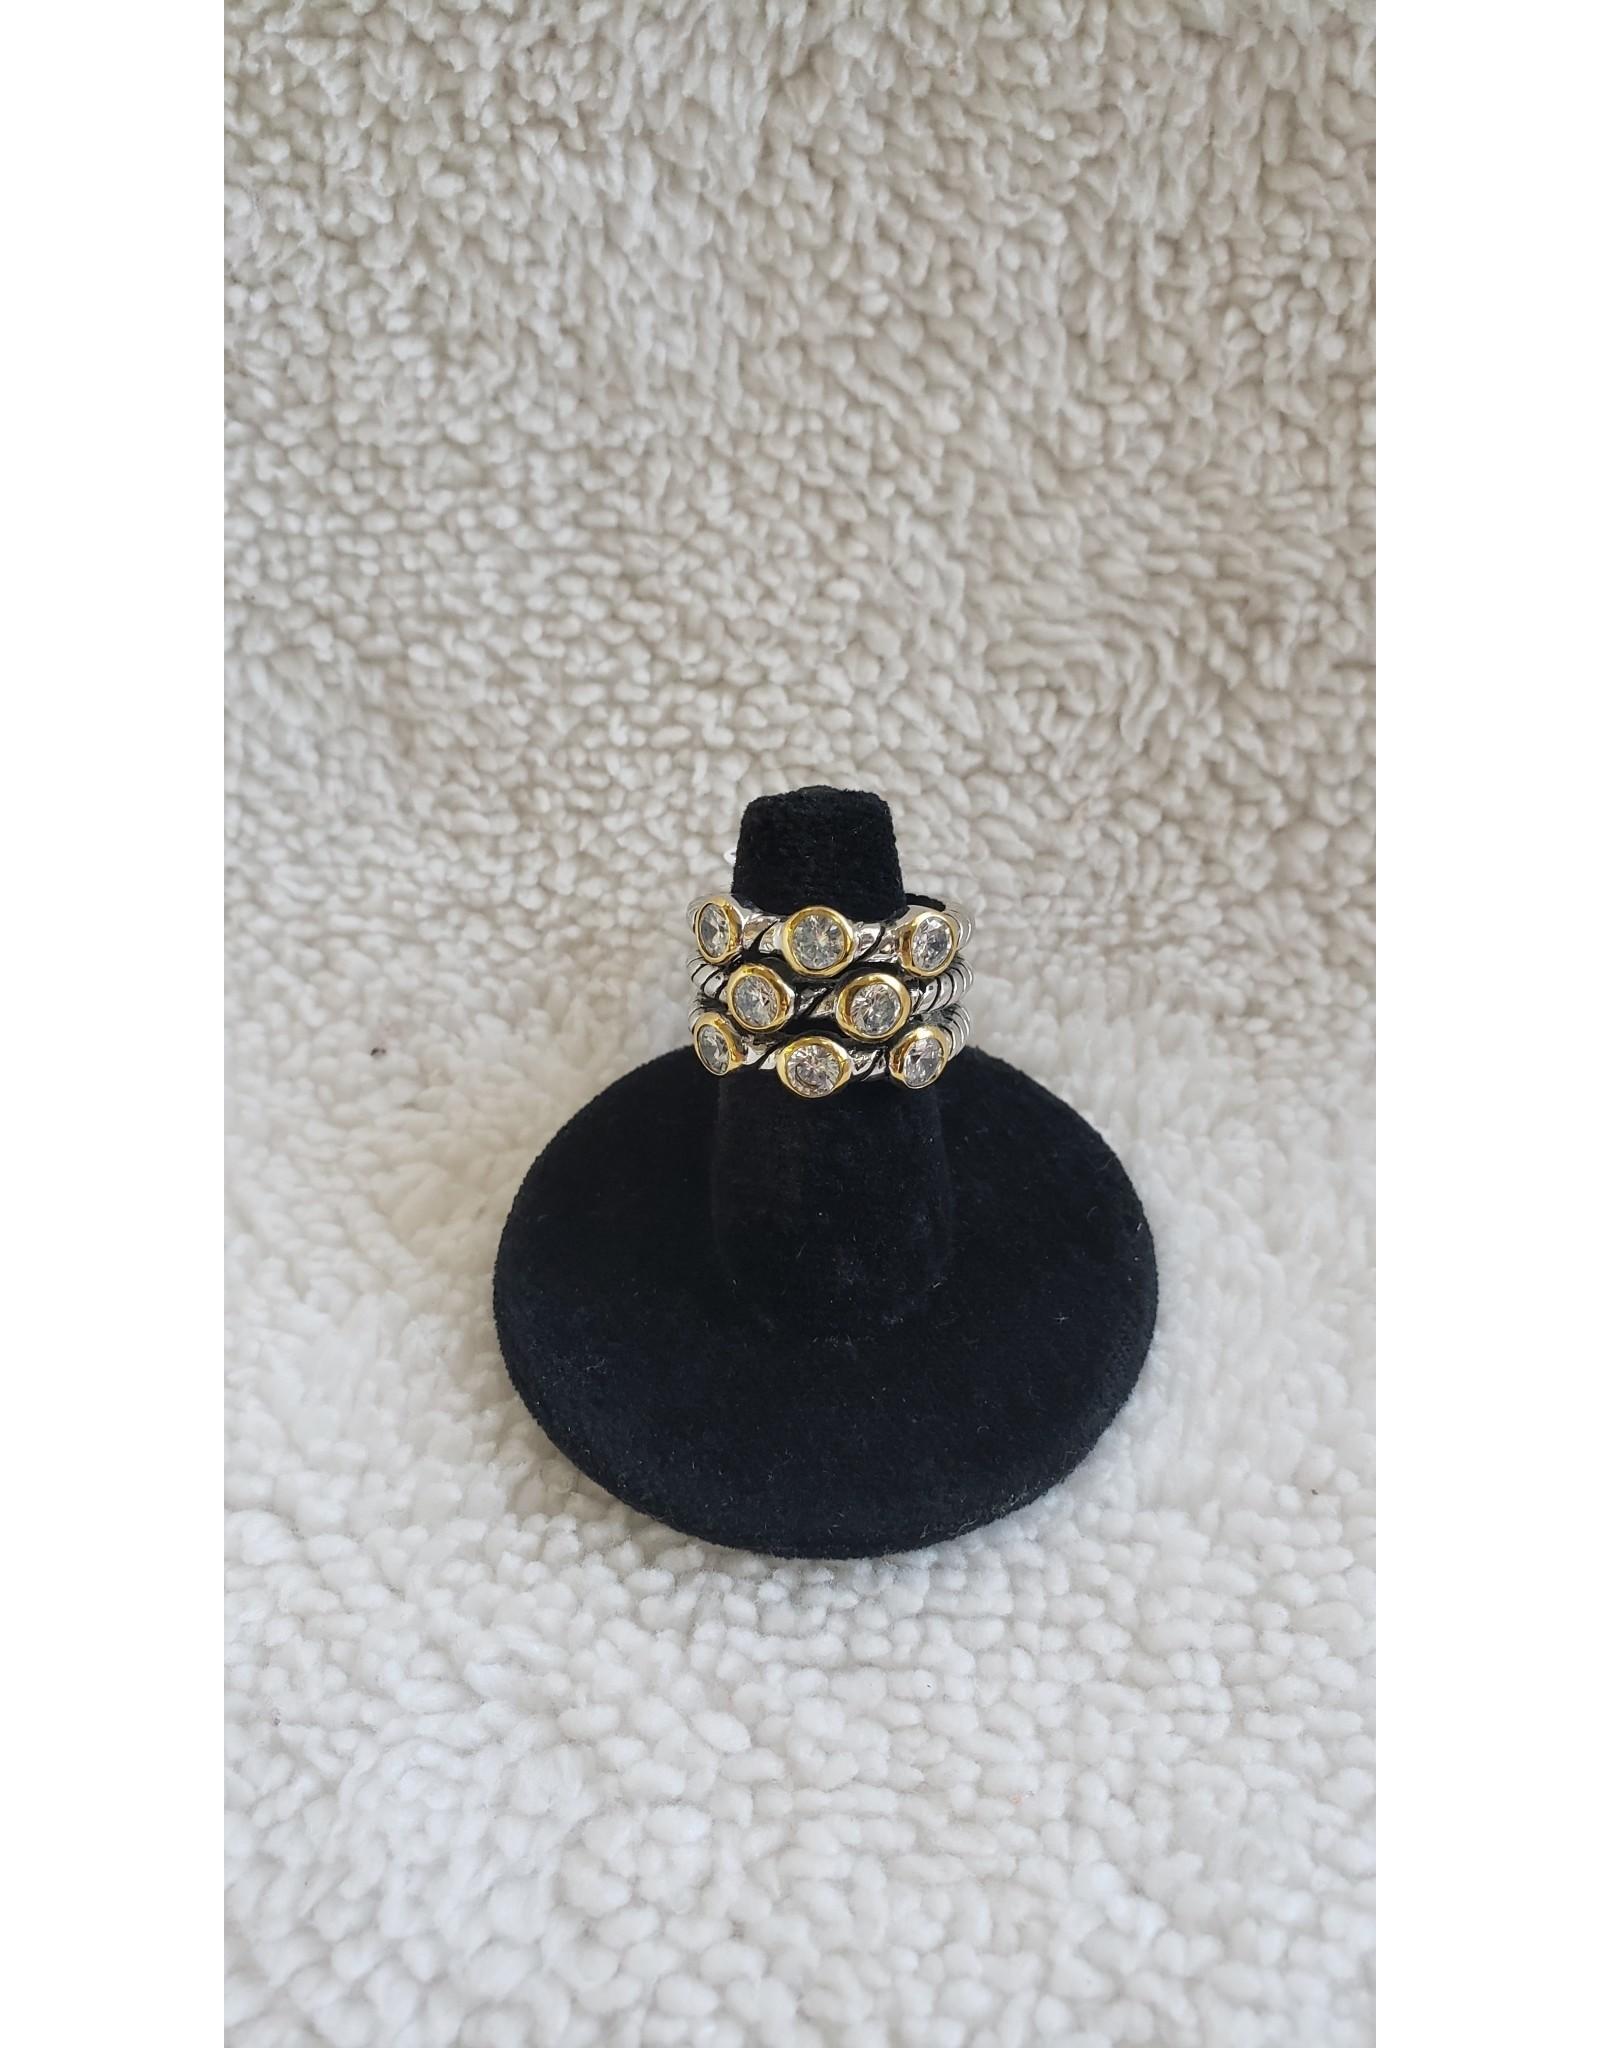 Multi Layered Jewel Ring | Size 6